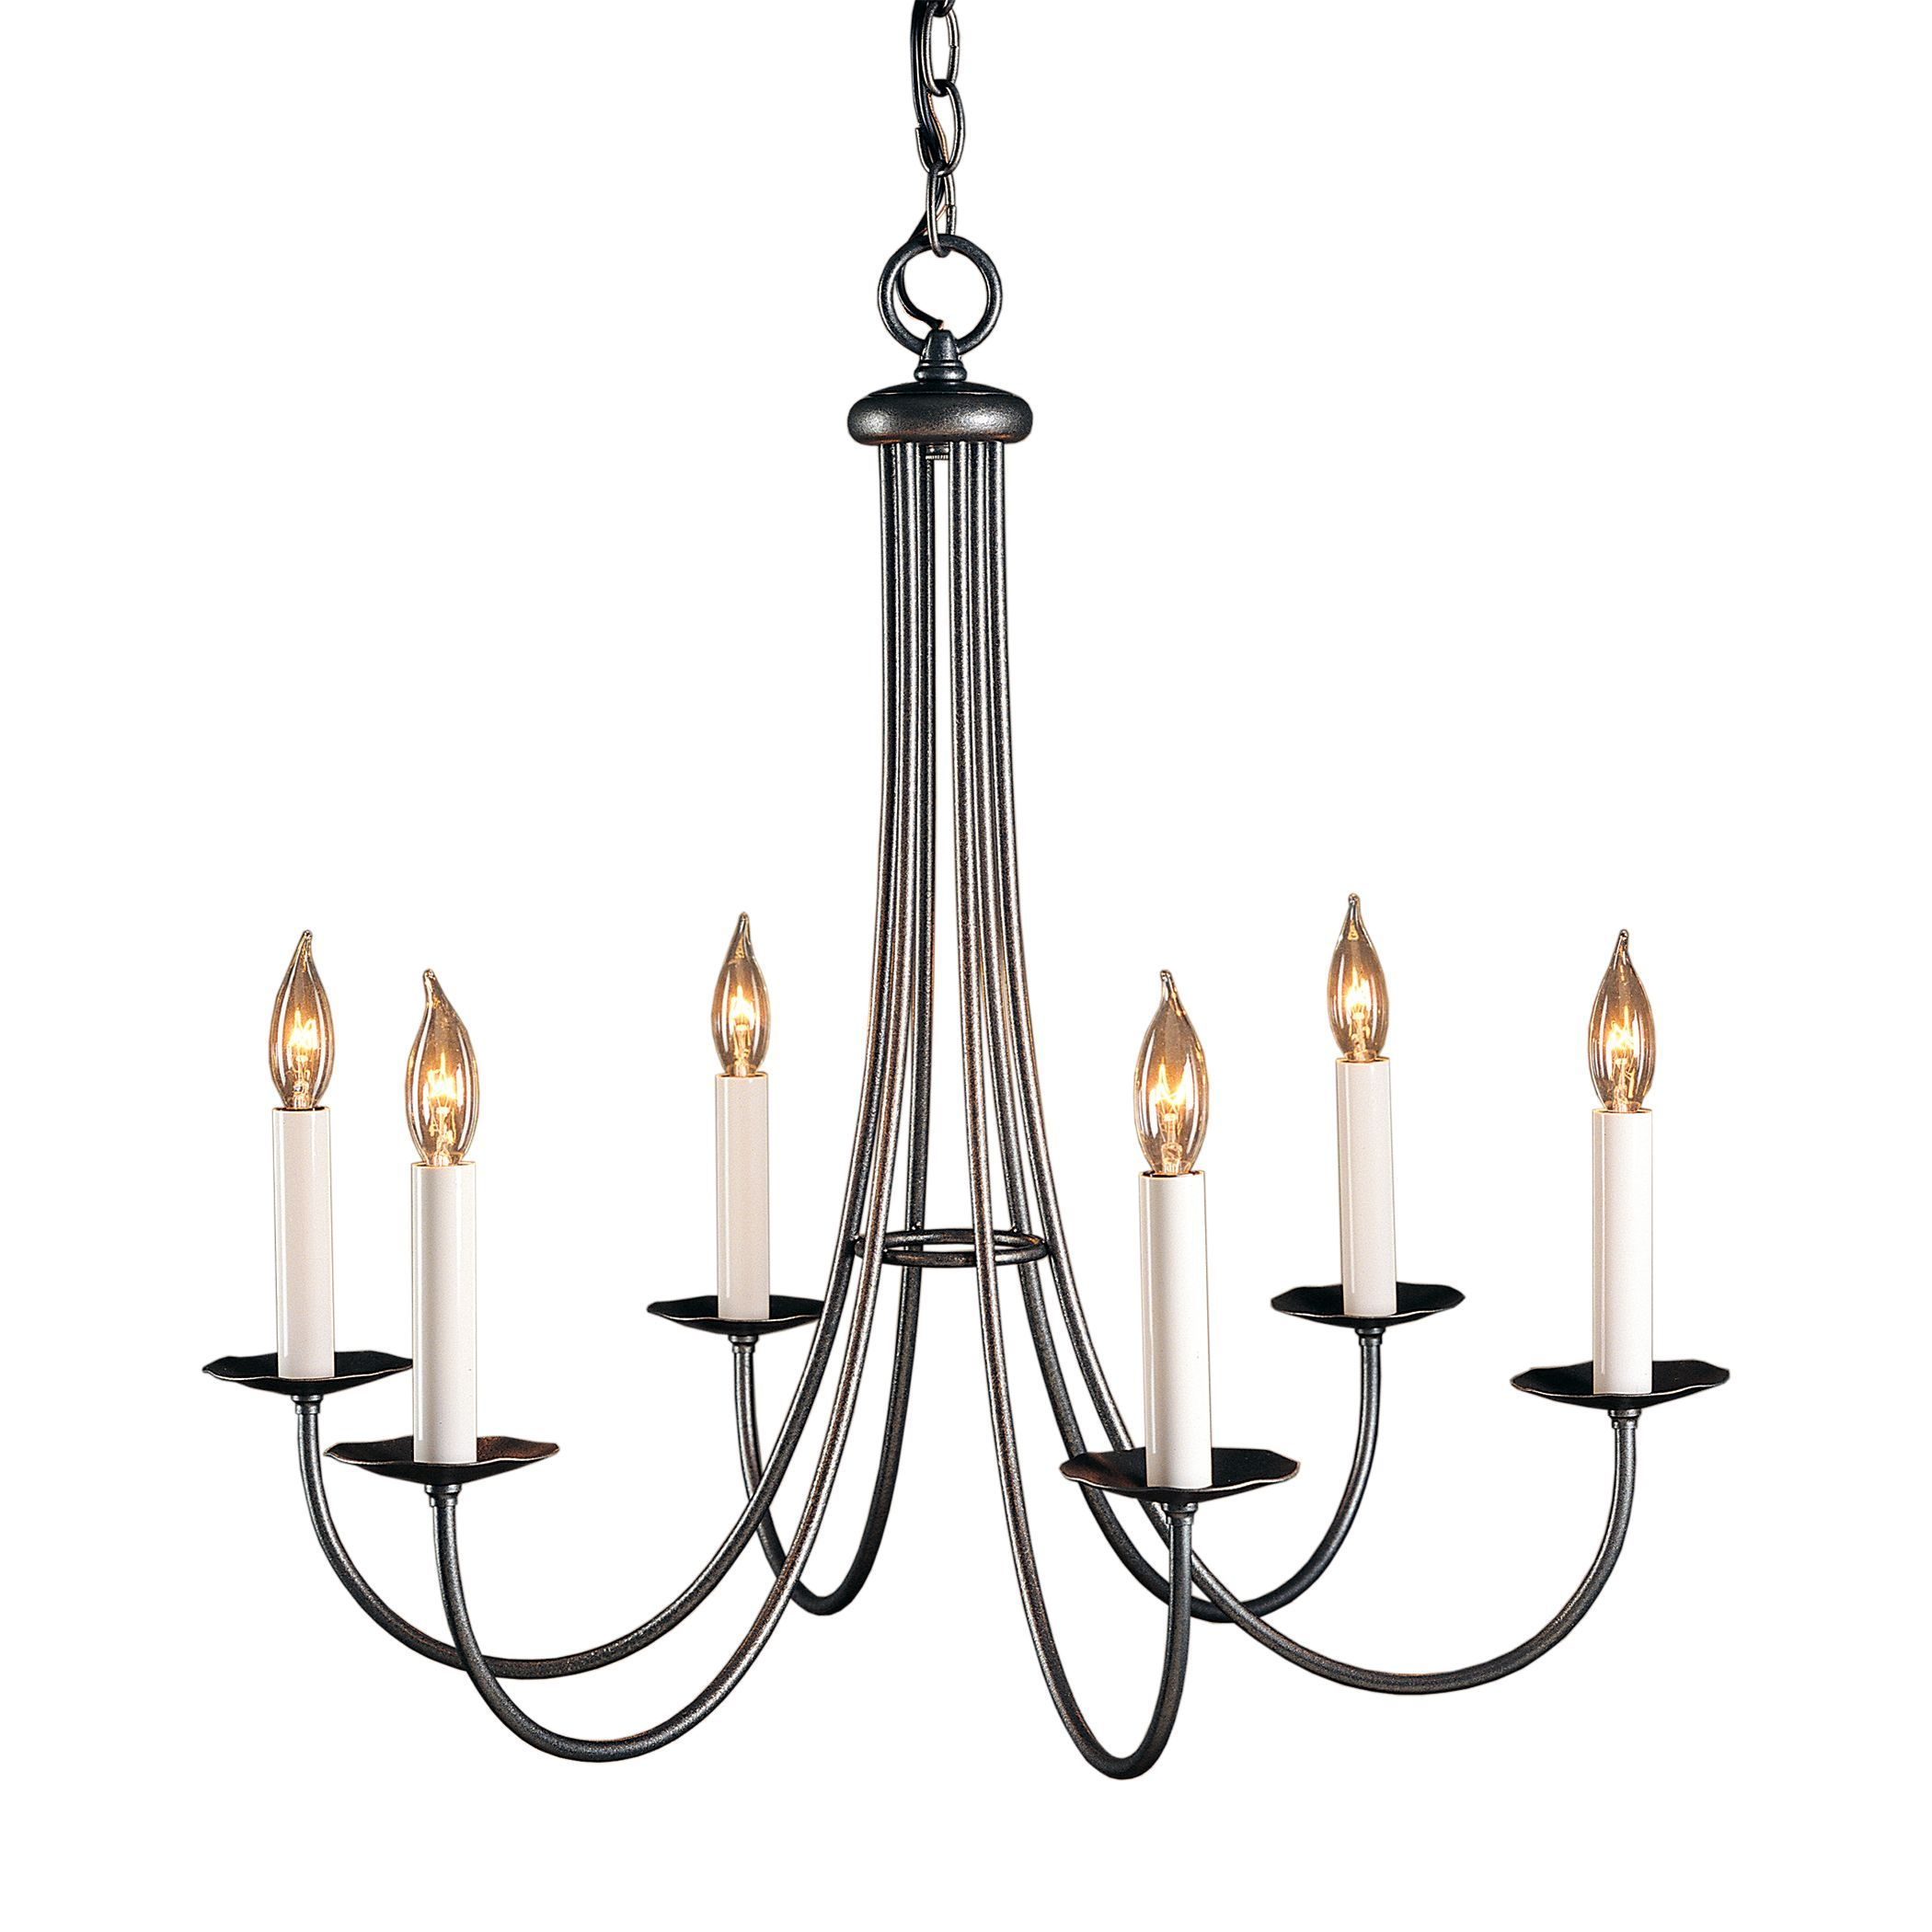 hubbardton forge lighting. Simple Lines 6 Arm Chandelier | Hubbardton Forge Lighting